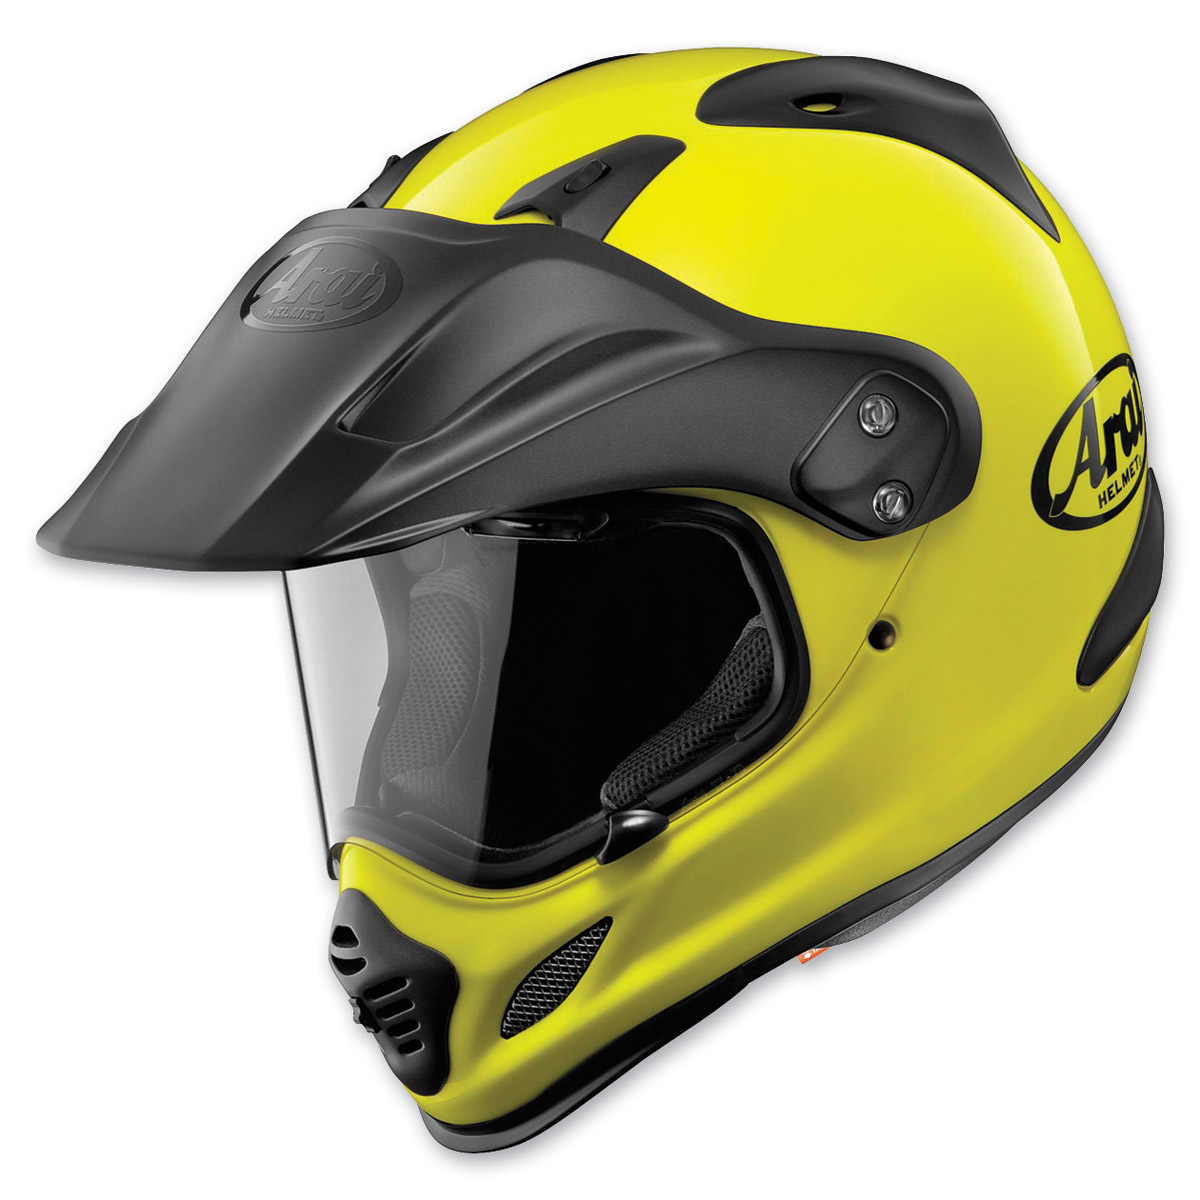 Arai XD4 Fluorescent Yellow Dual Sport Helmet